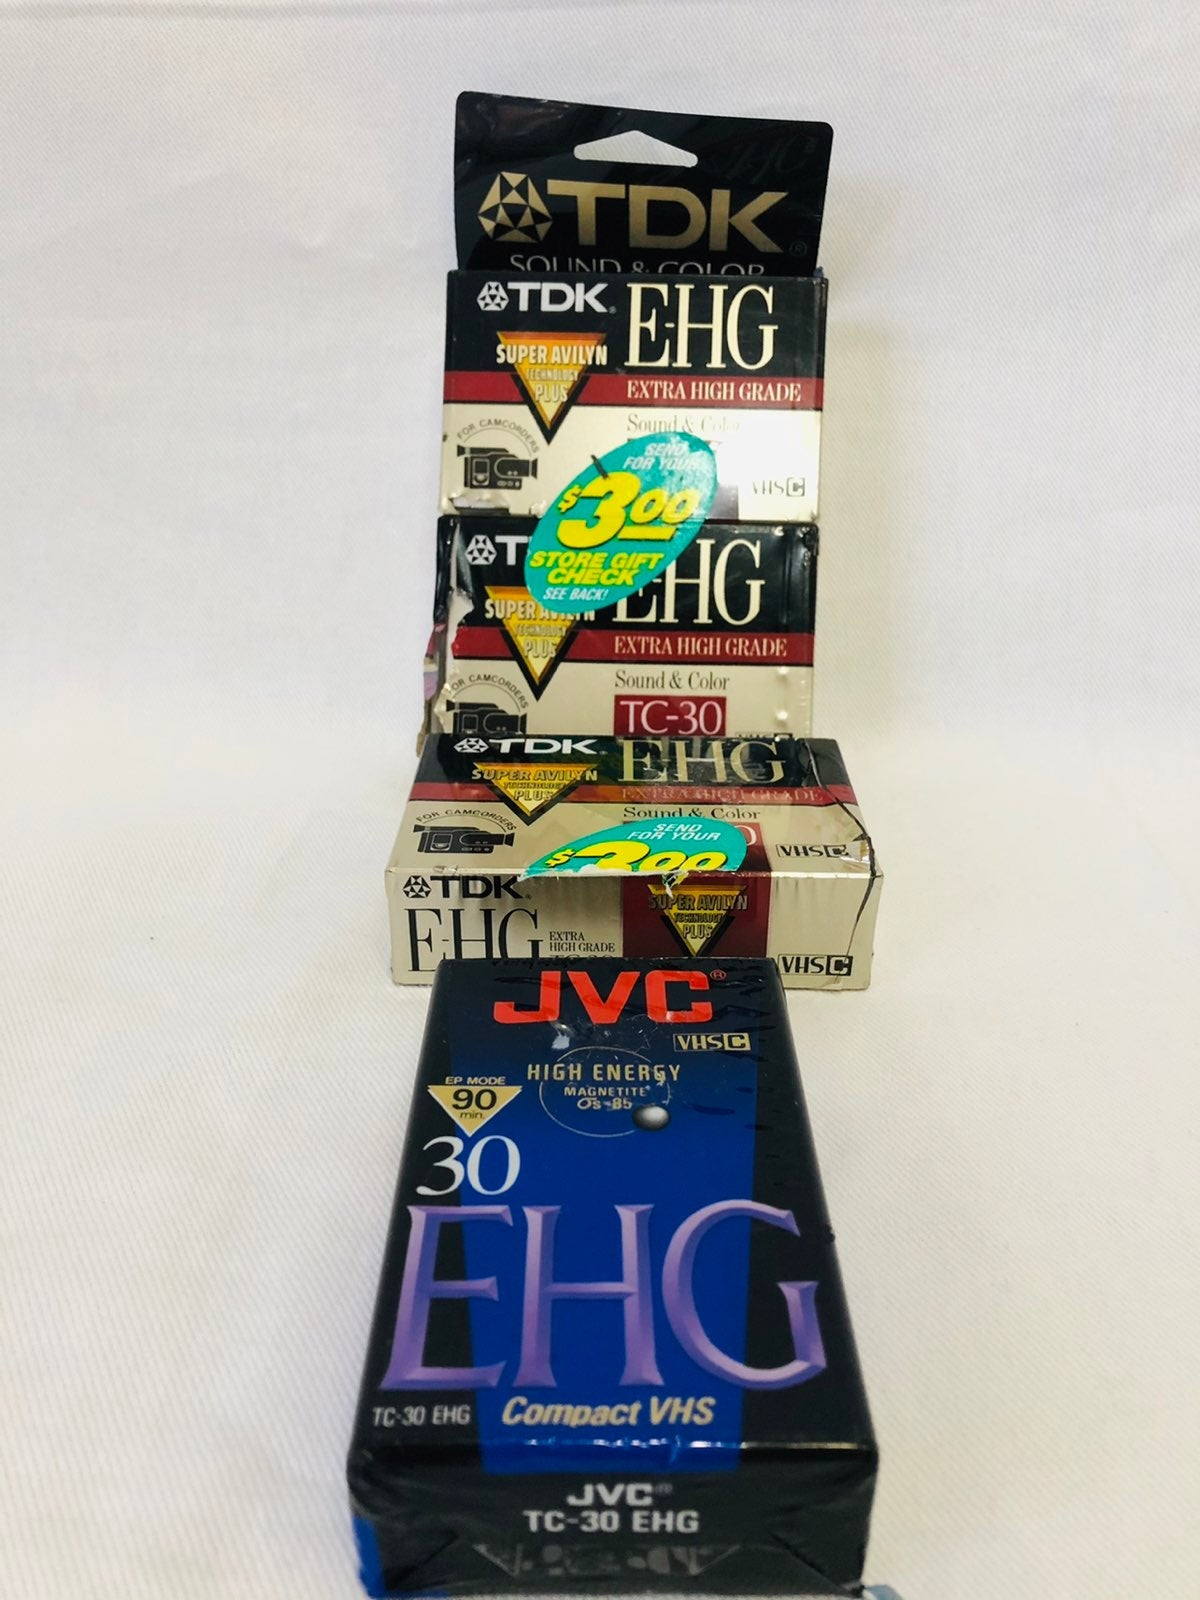 4 New compact VHS C discs.